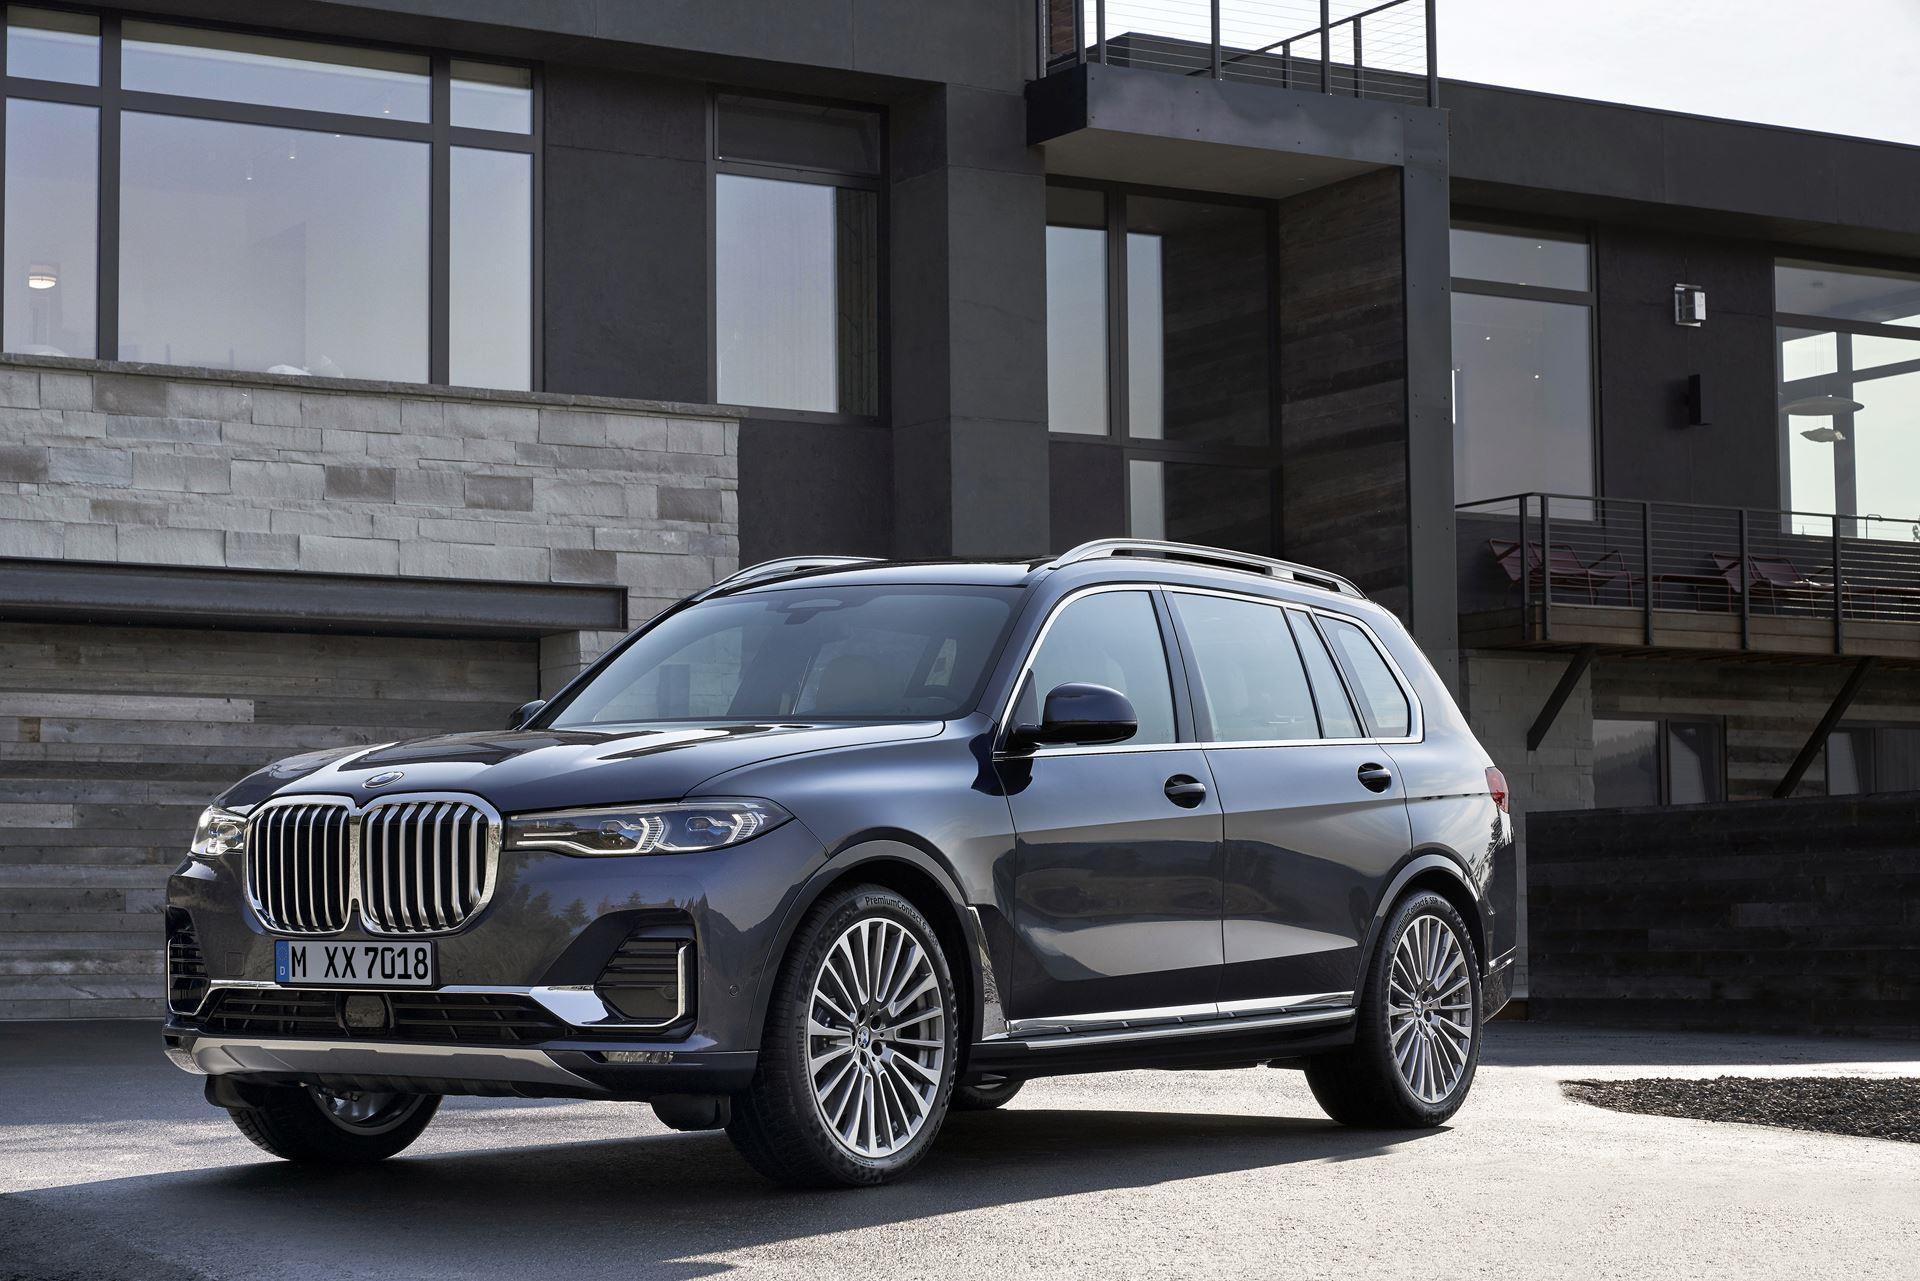 2020 BMW X7 And X7M Price >> 2019 BMW X7 News and Information | conceptcarz.com